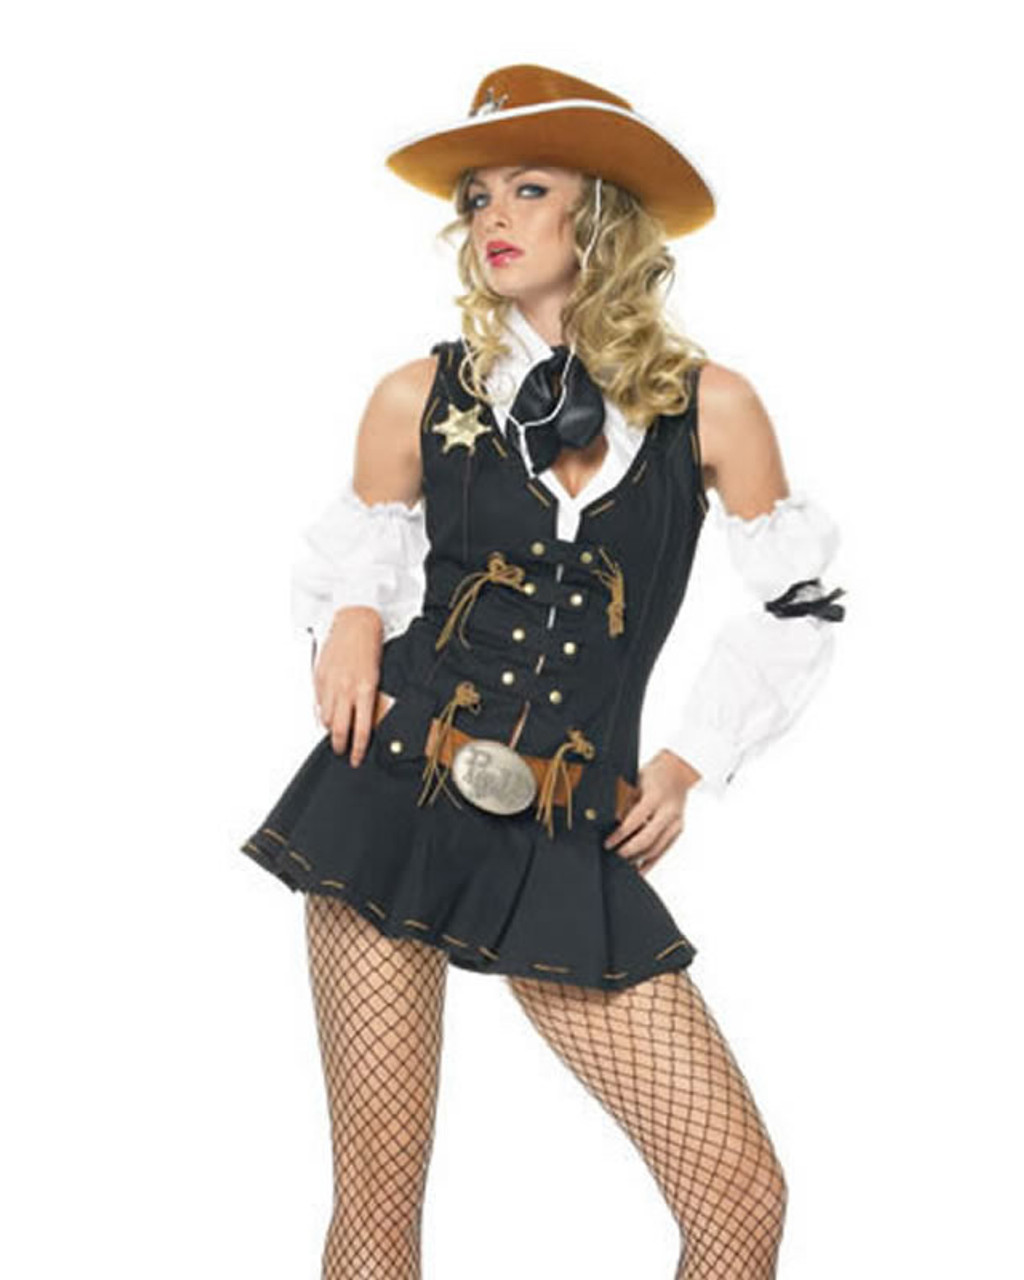 f4c2a6da6b71c Leg Avenue   LA-83365, Wild West Sheriff Costume